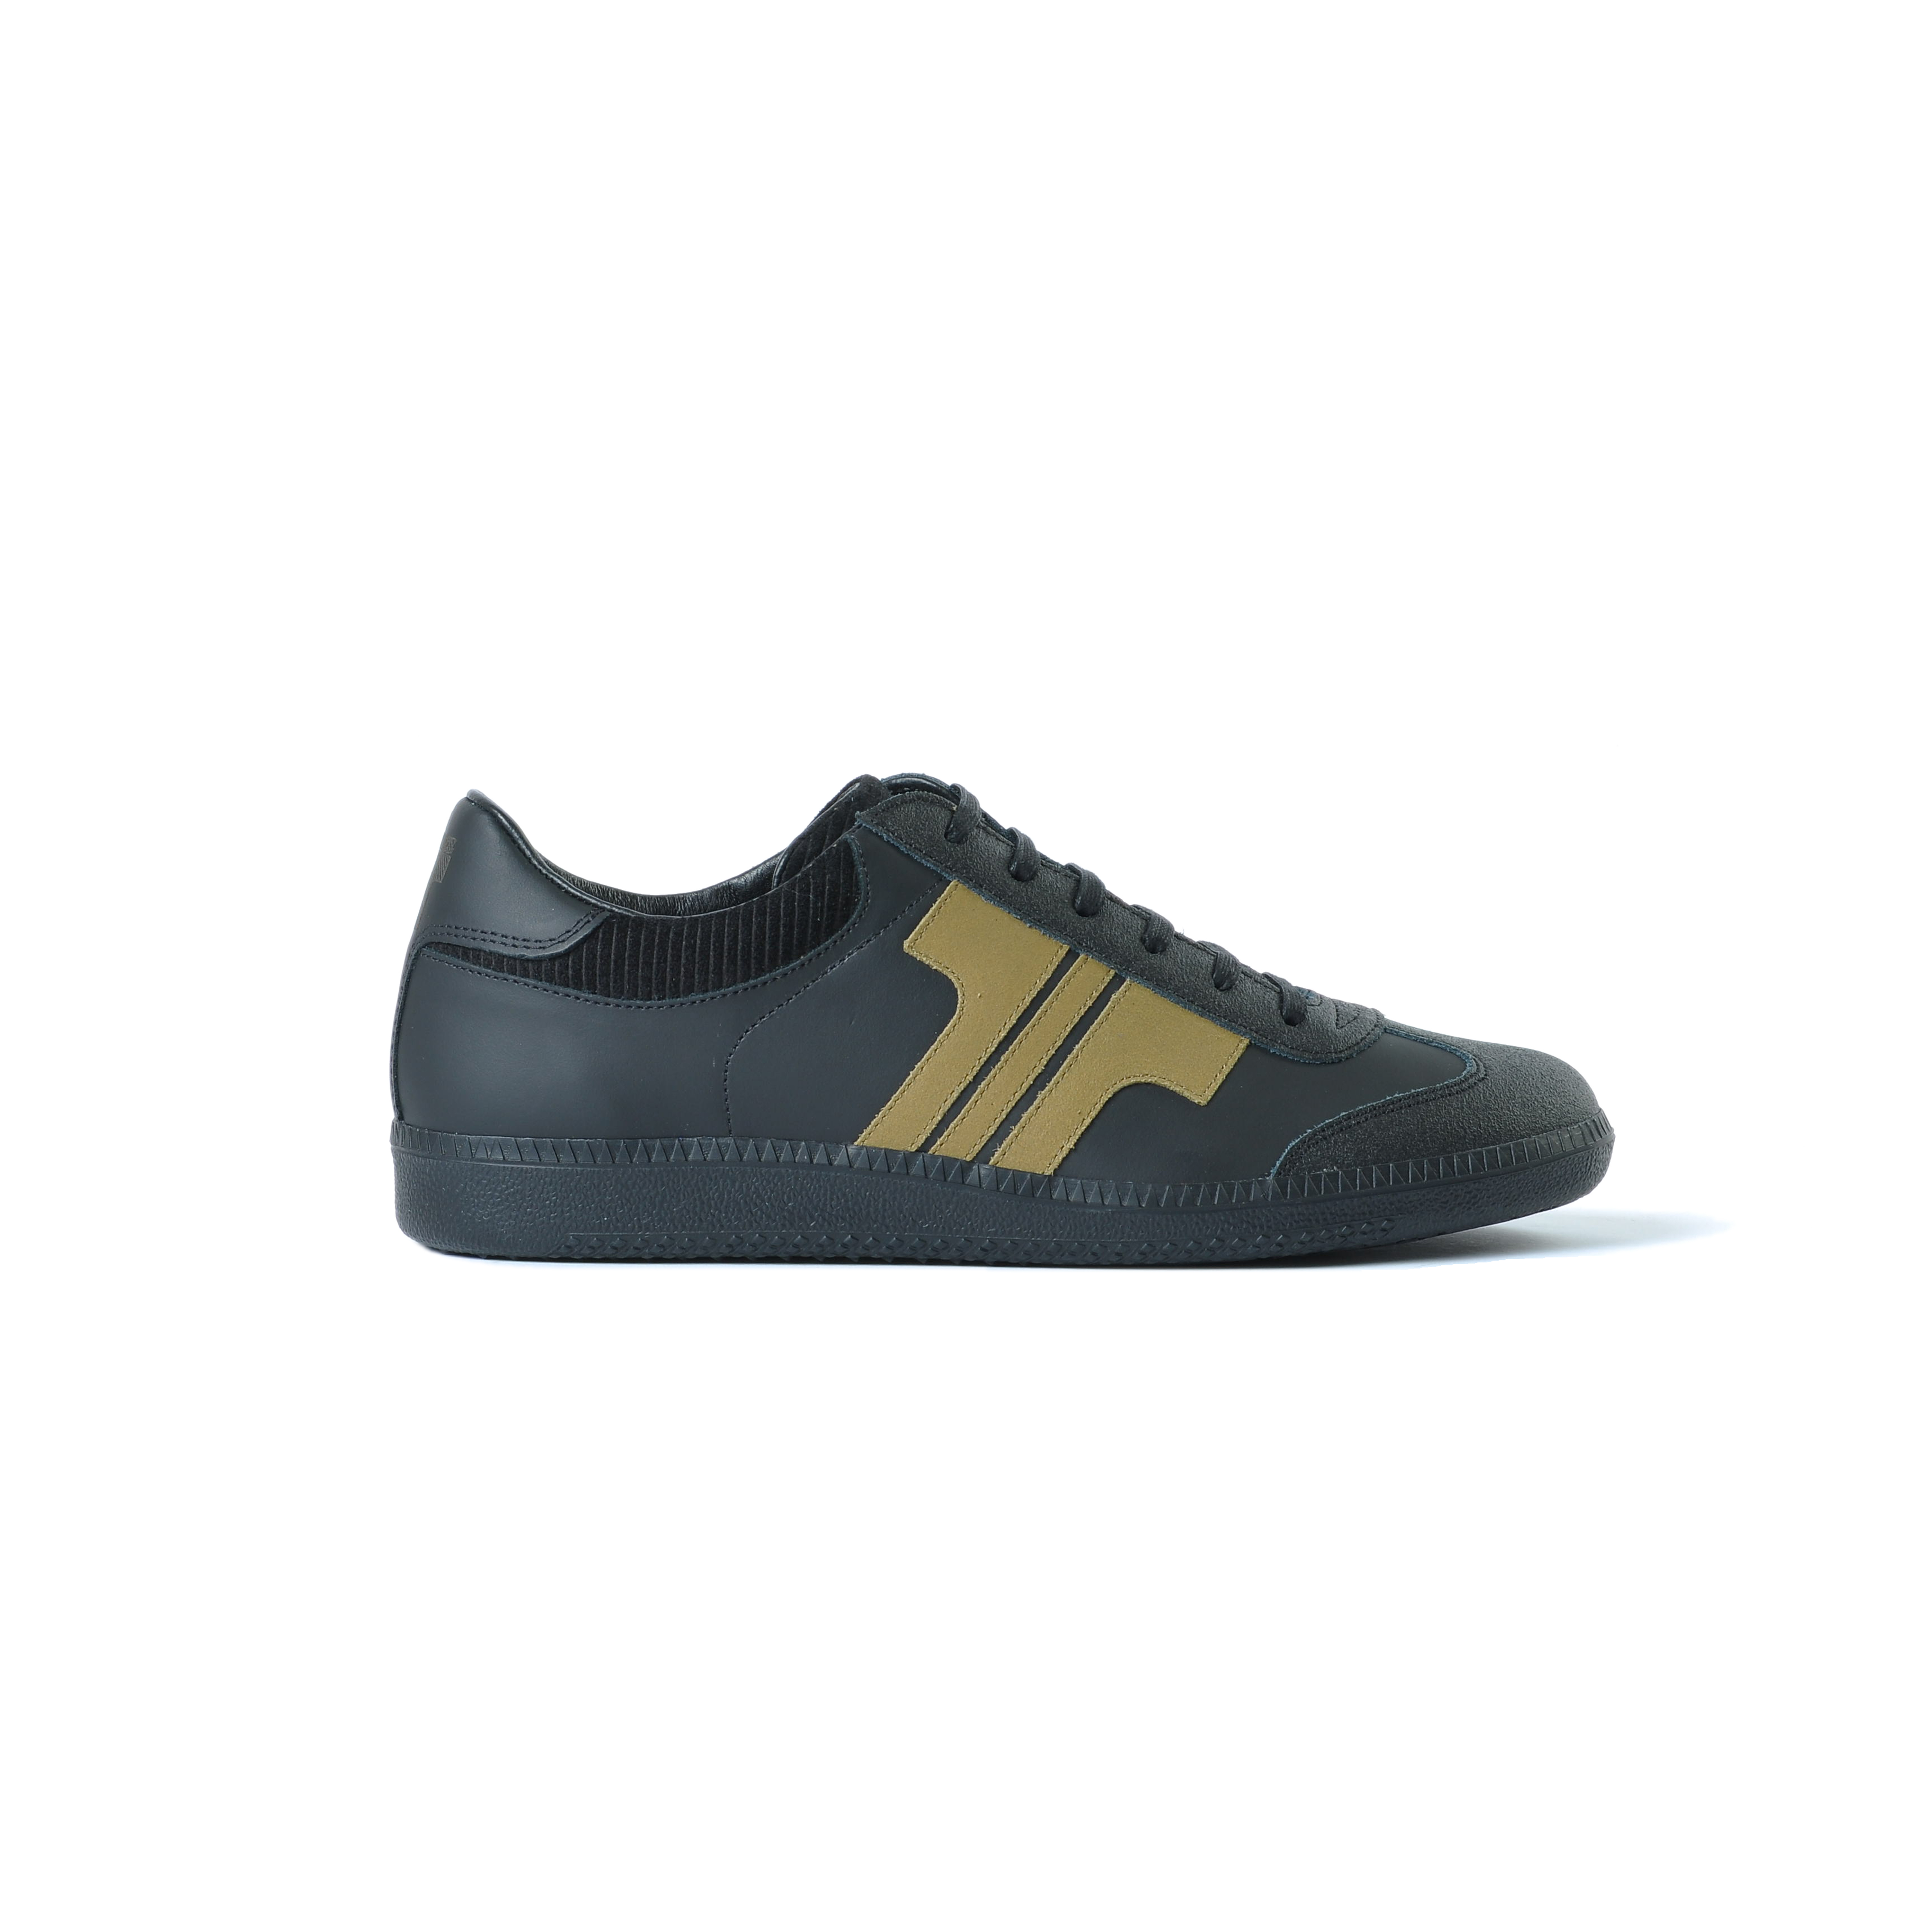 Tisza cipő - Compakt - Fekete-keki